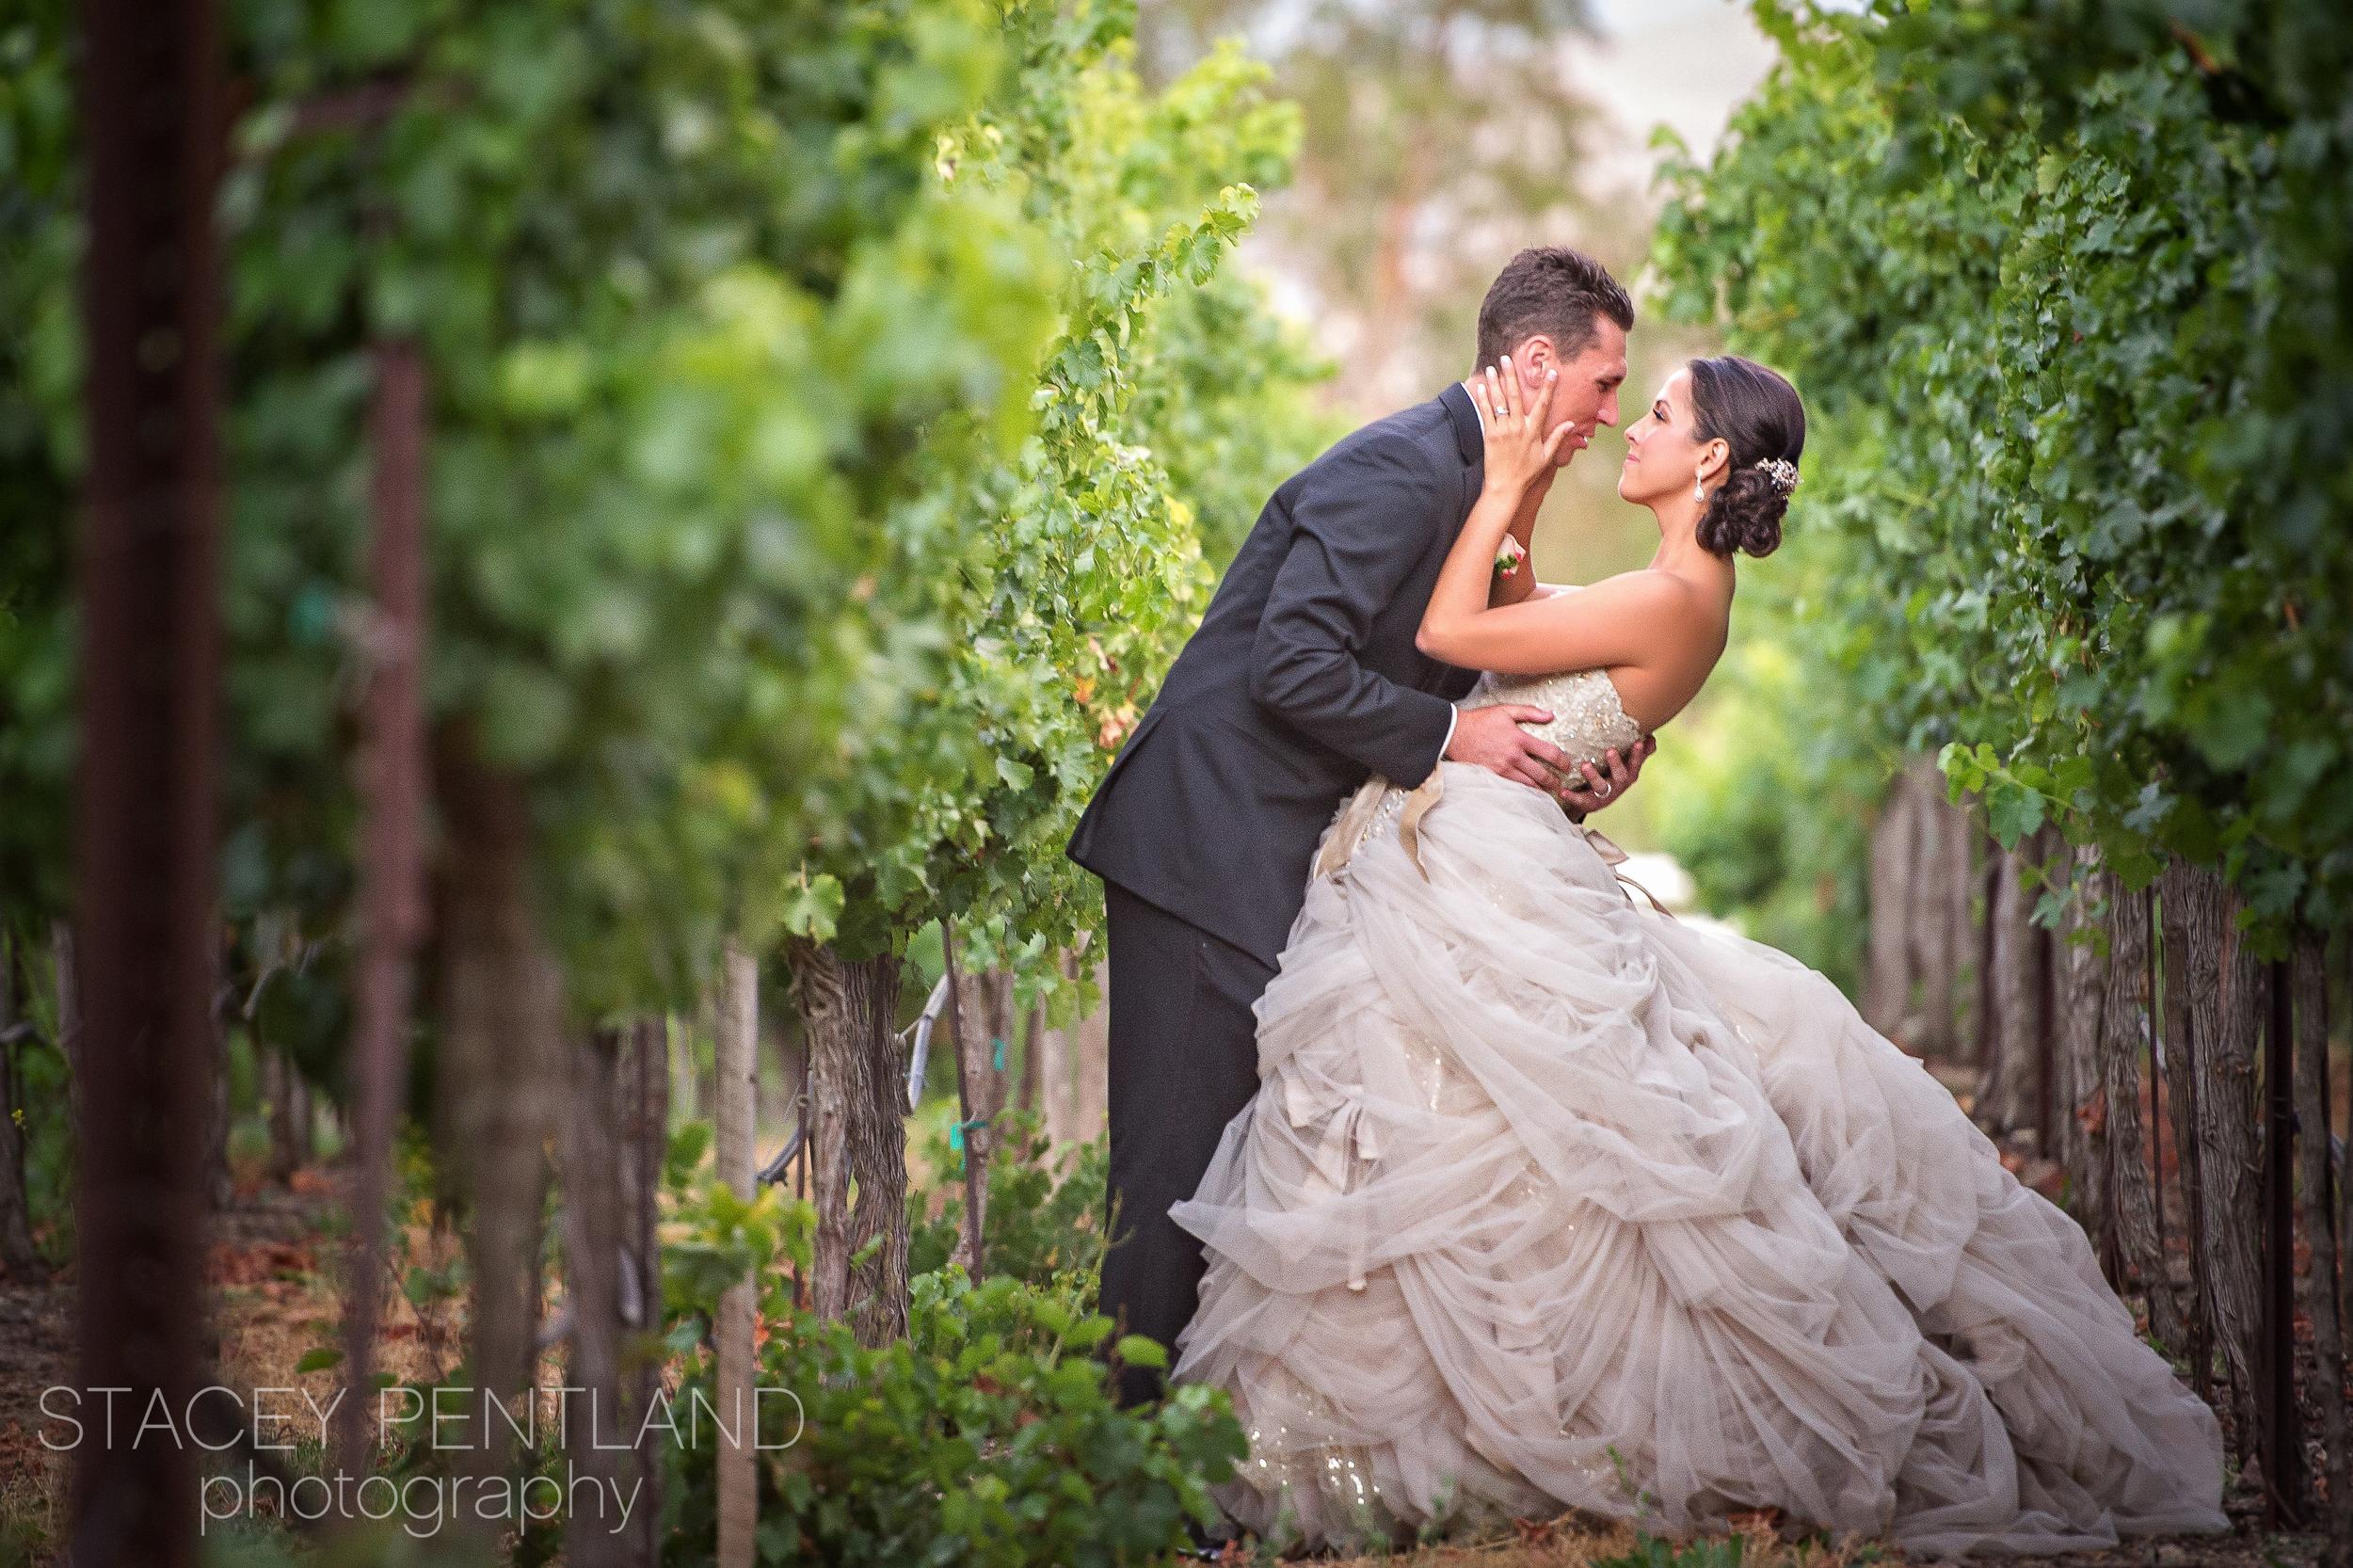 brie+chris_wedding_spp_001.jpg